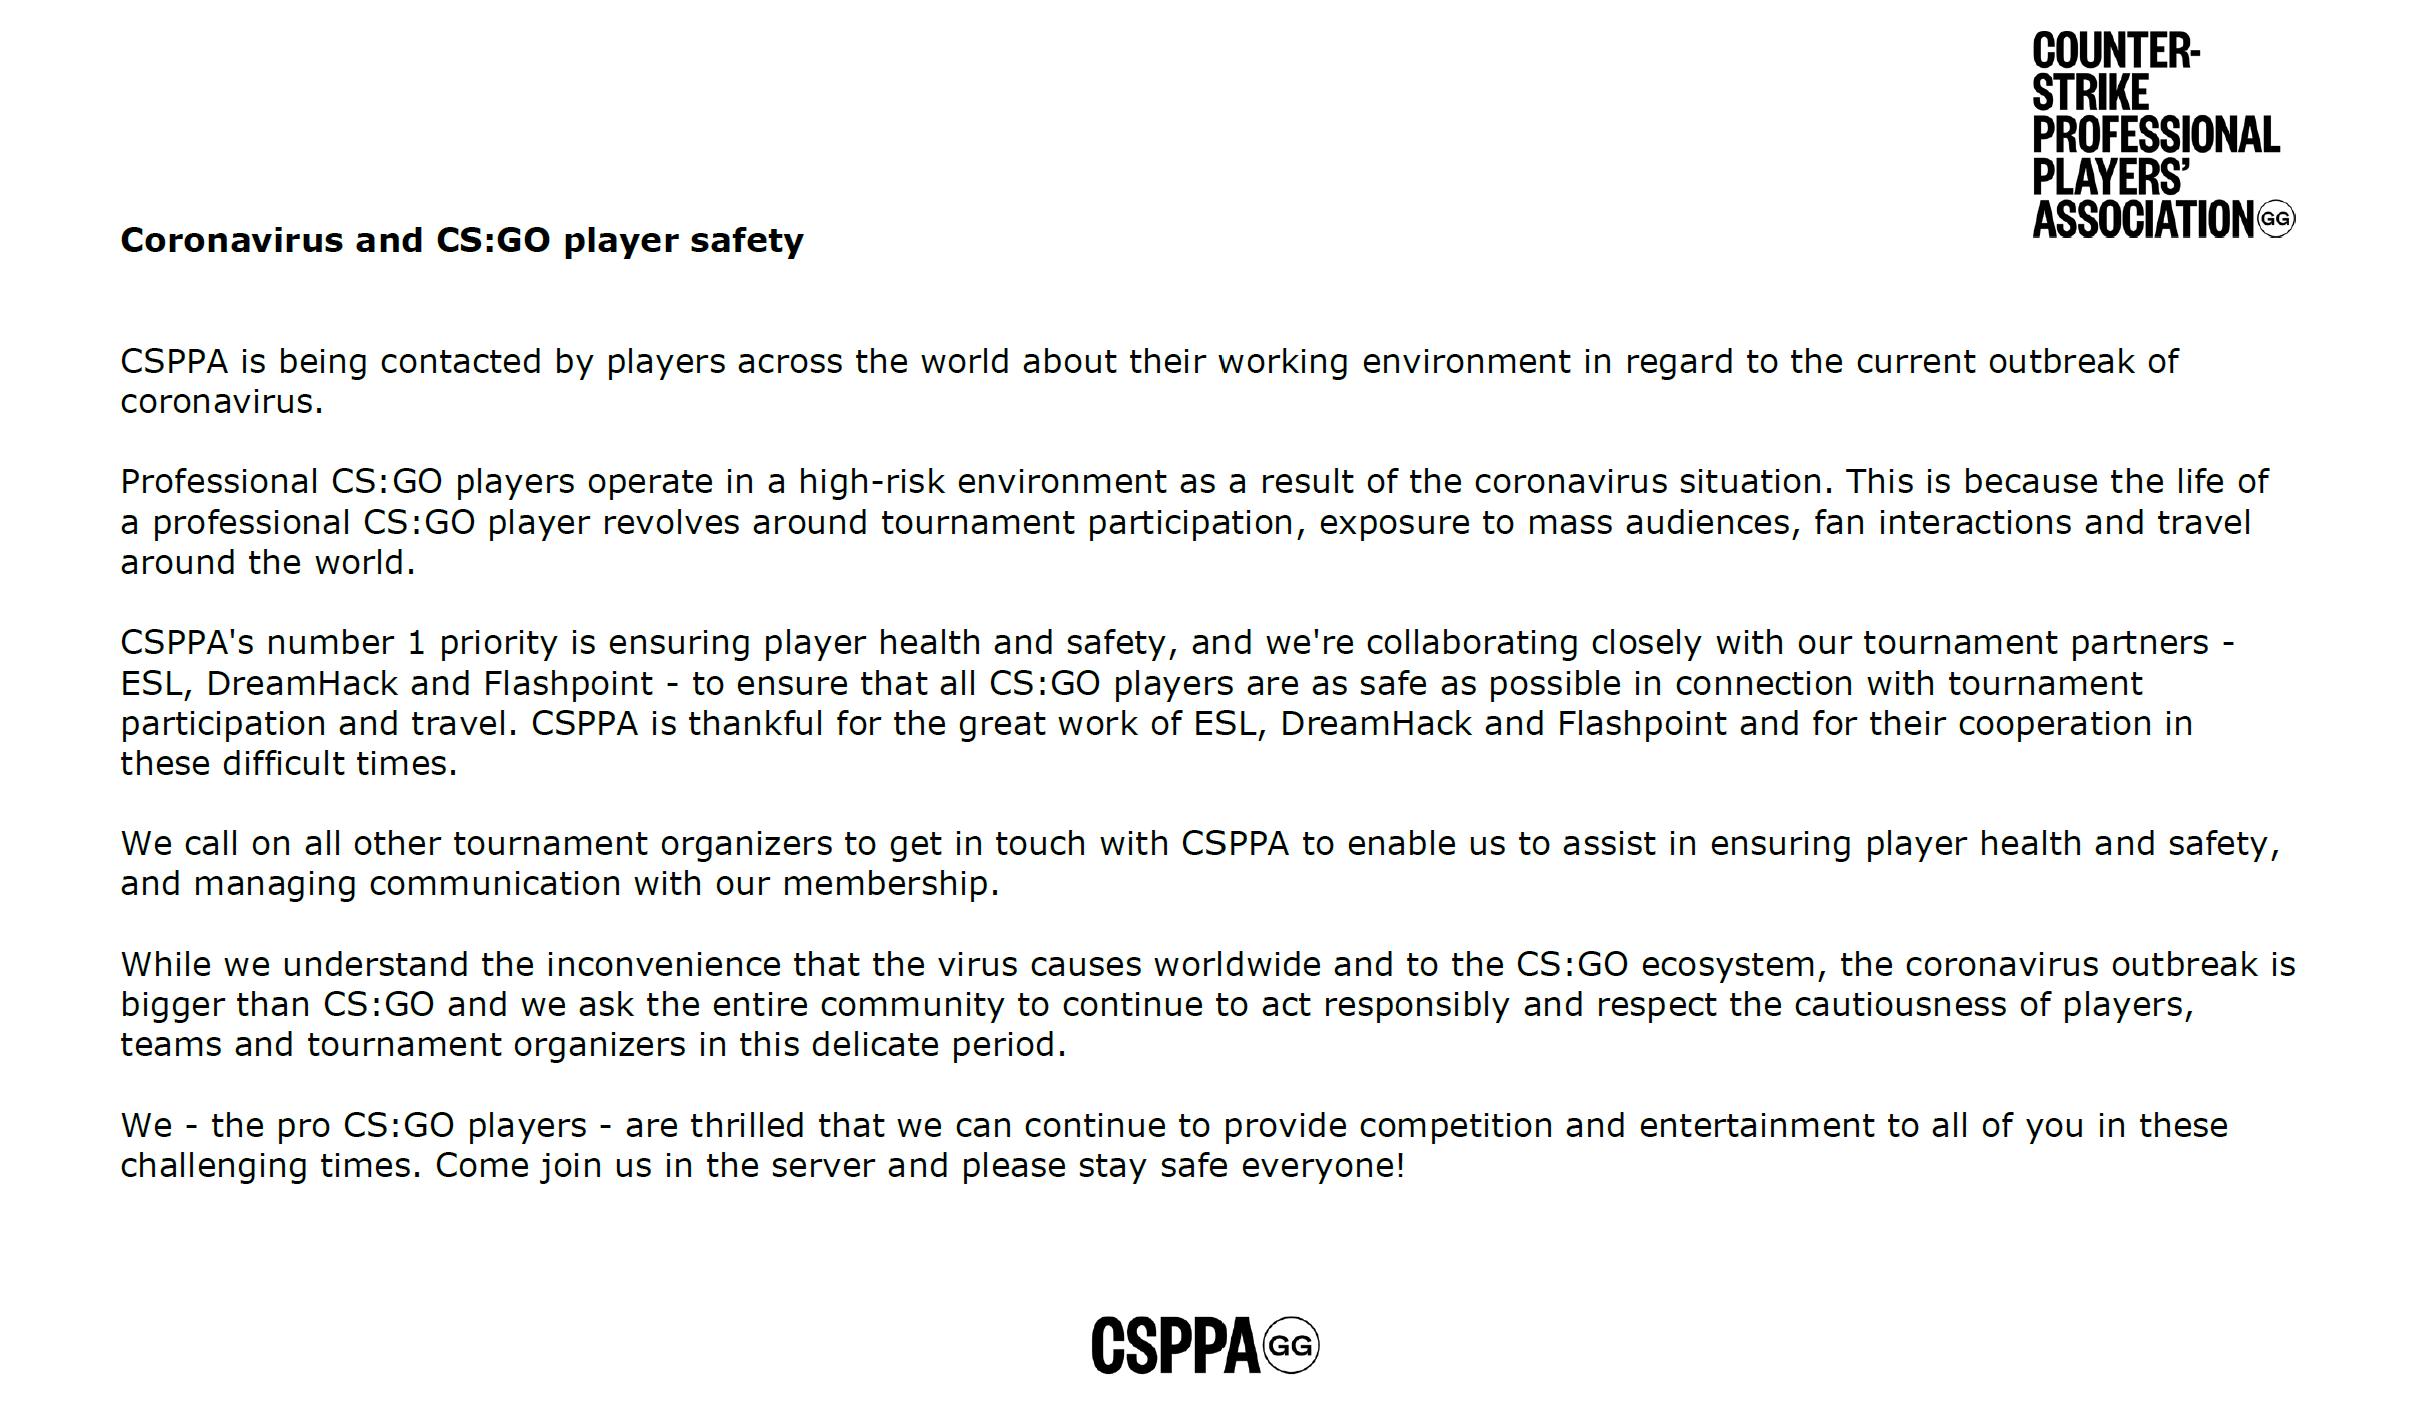 CSPPA發文致謝主辦方的付出,呼吁嚴肅對待疫情爆發